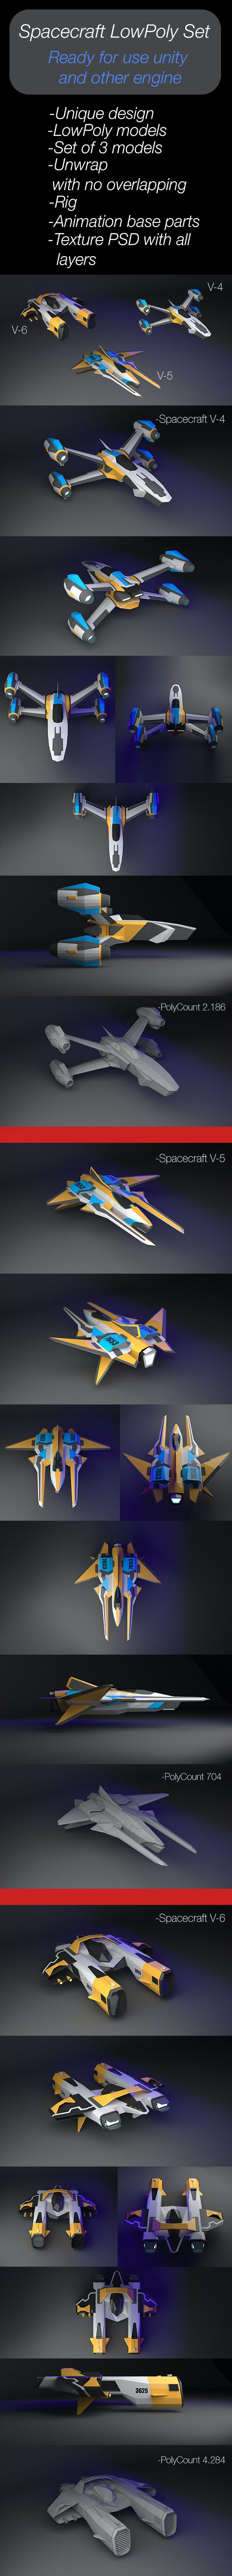 Spacecraft LowPoly Set of 3 models - 3DOcean Item for Sale